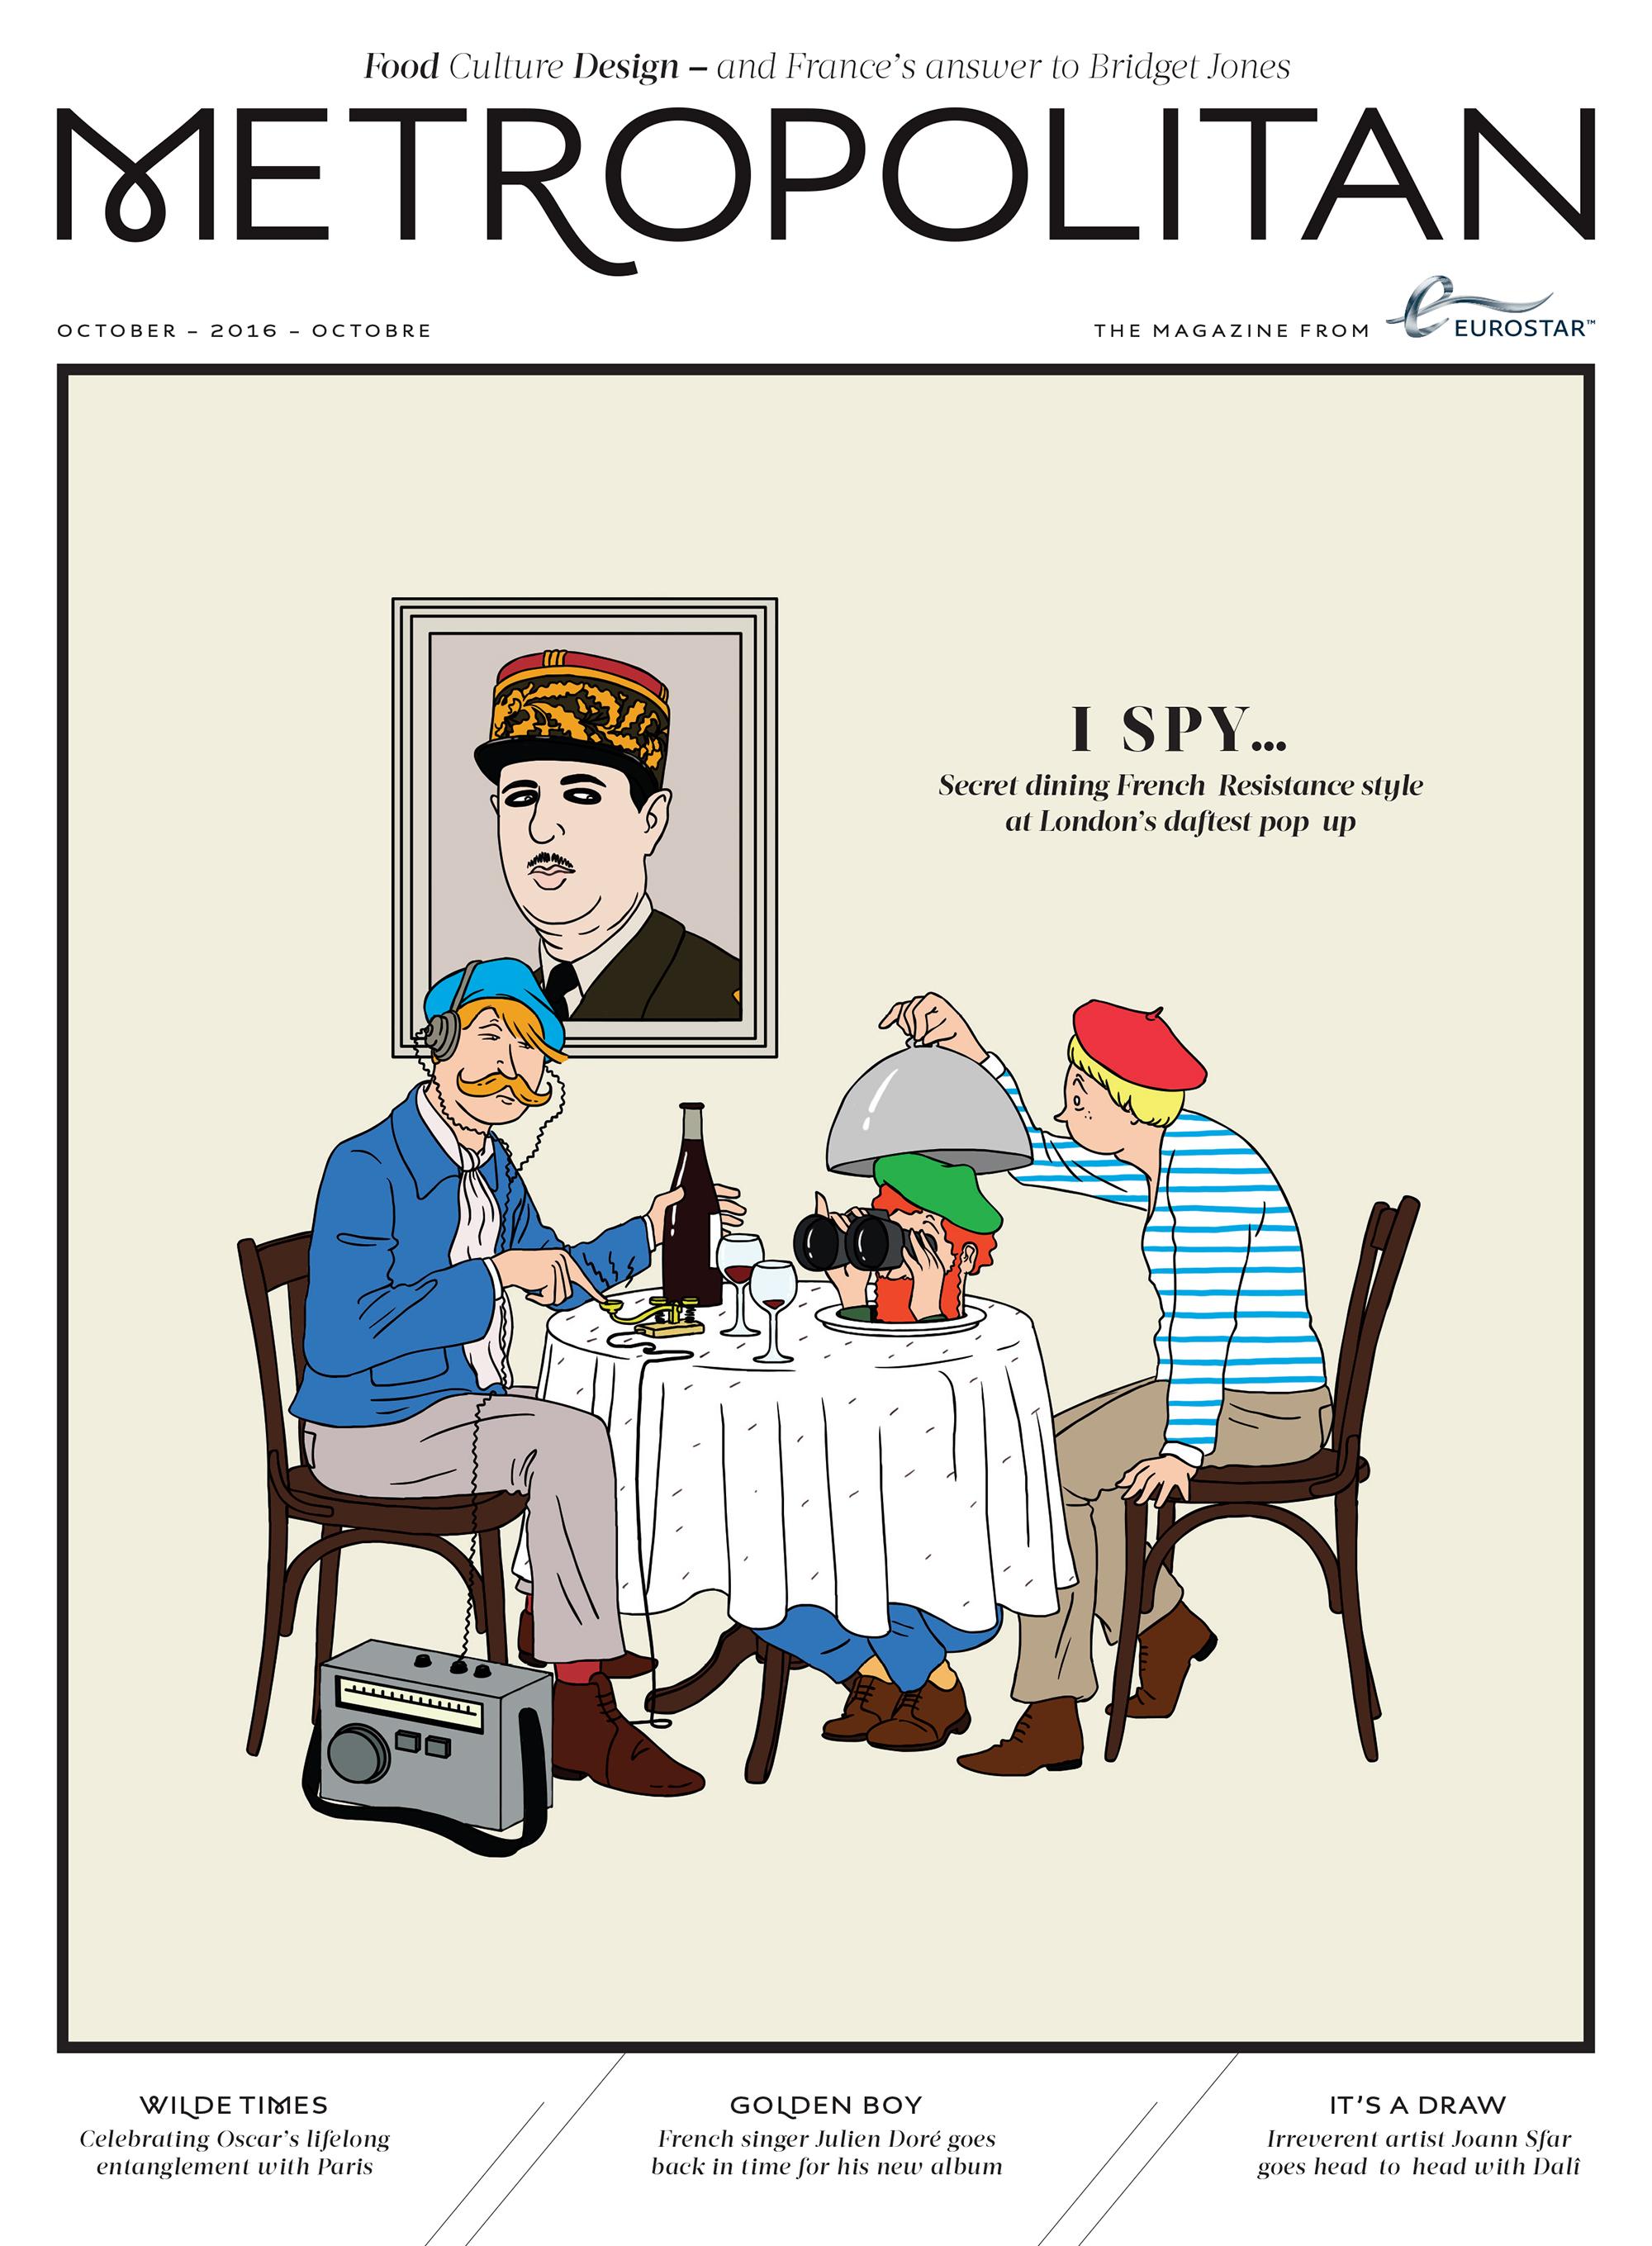 Metropolitan Magazine by Jean-Michel Tixier   Agent Pekka